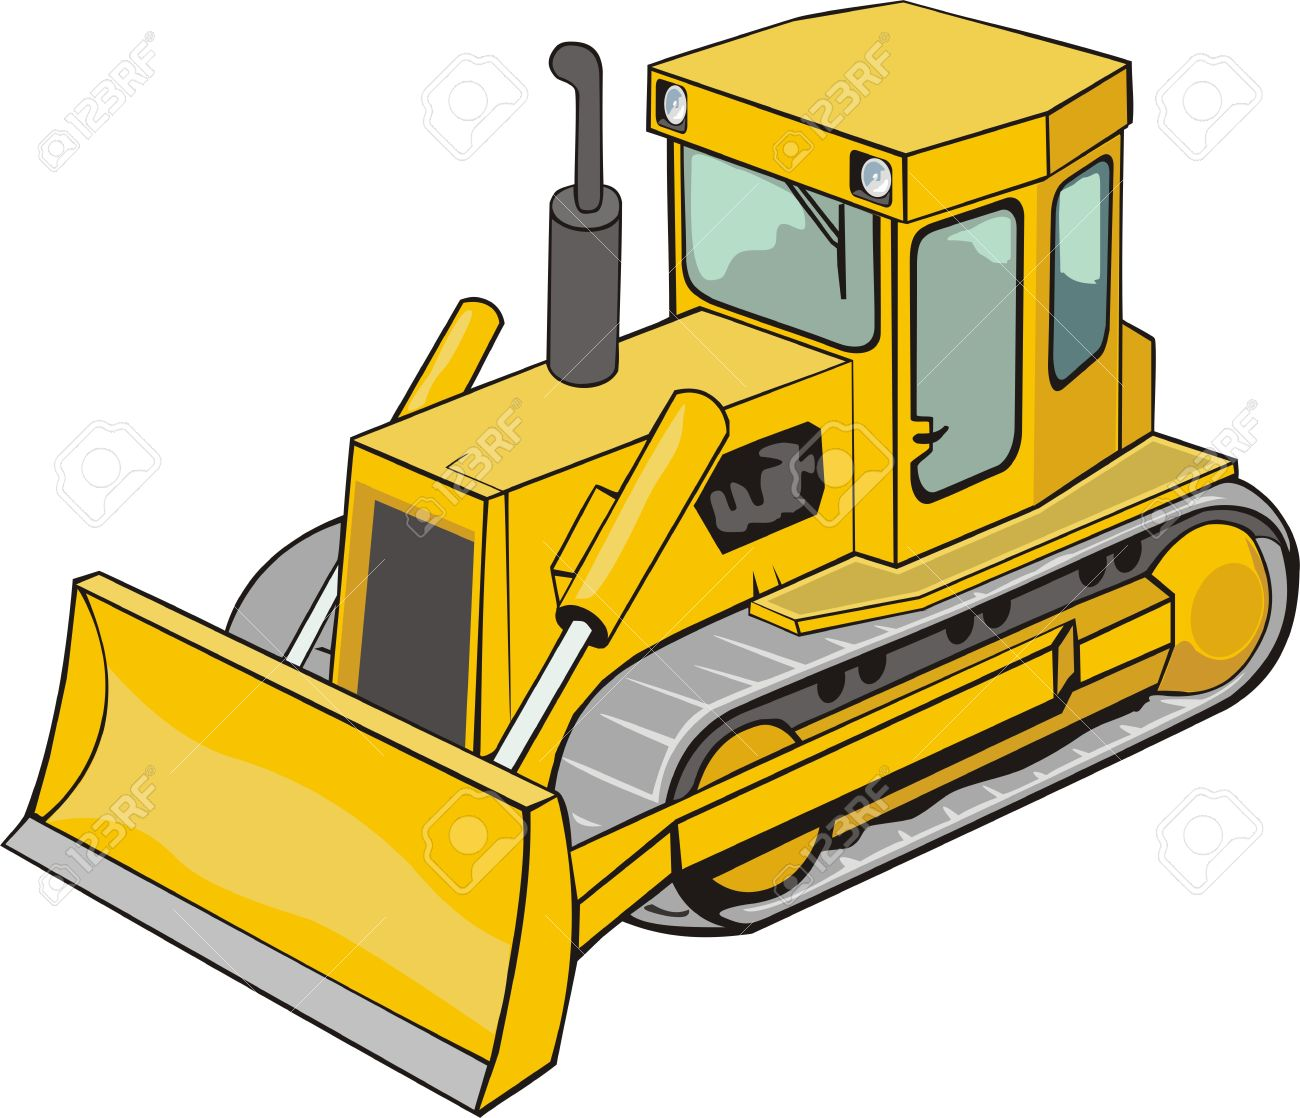 373 Bulldozer free clipart.